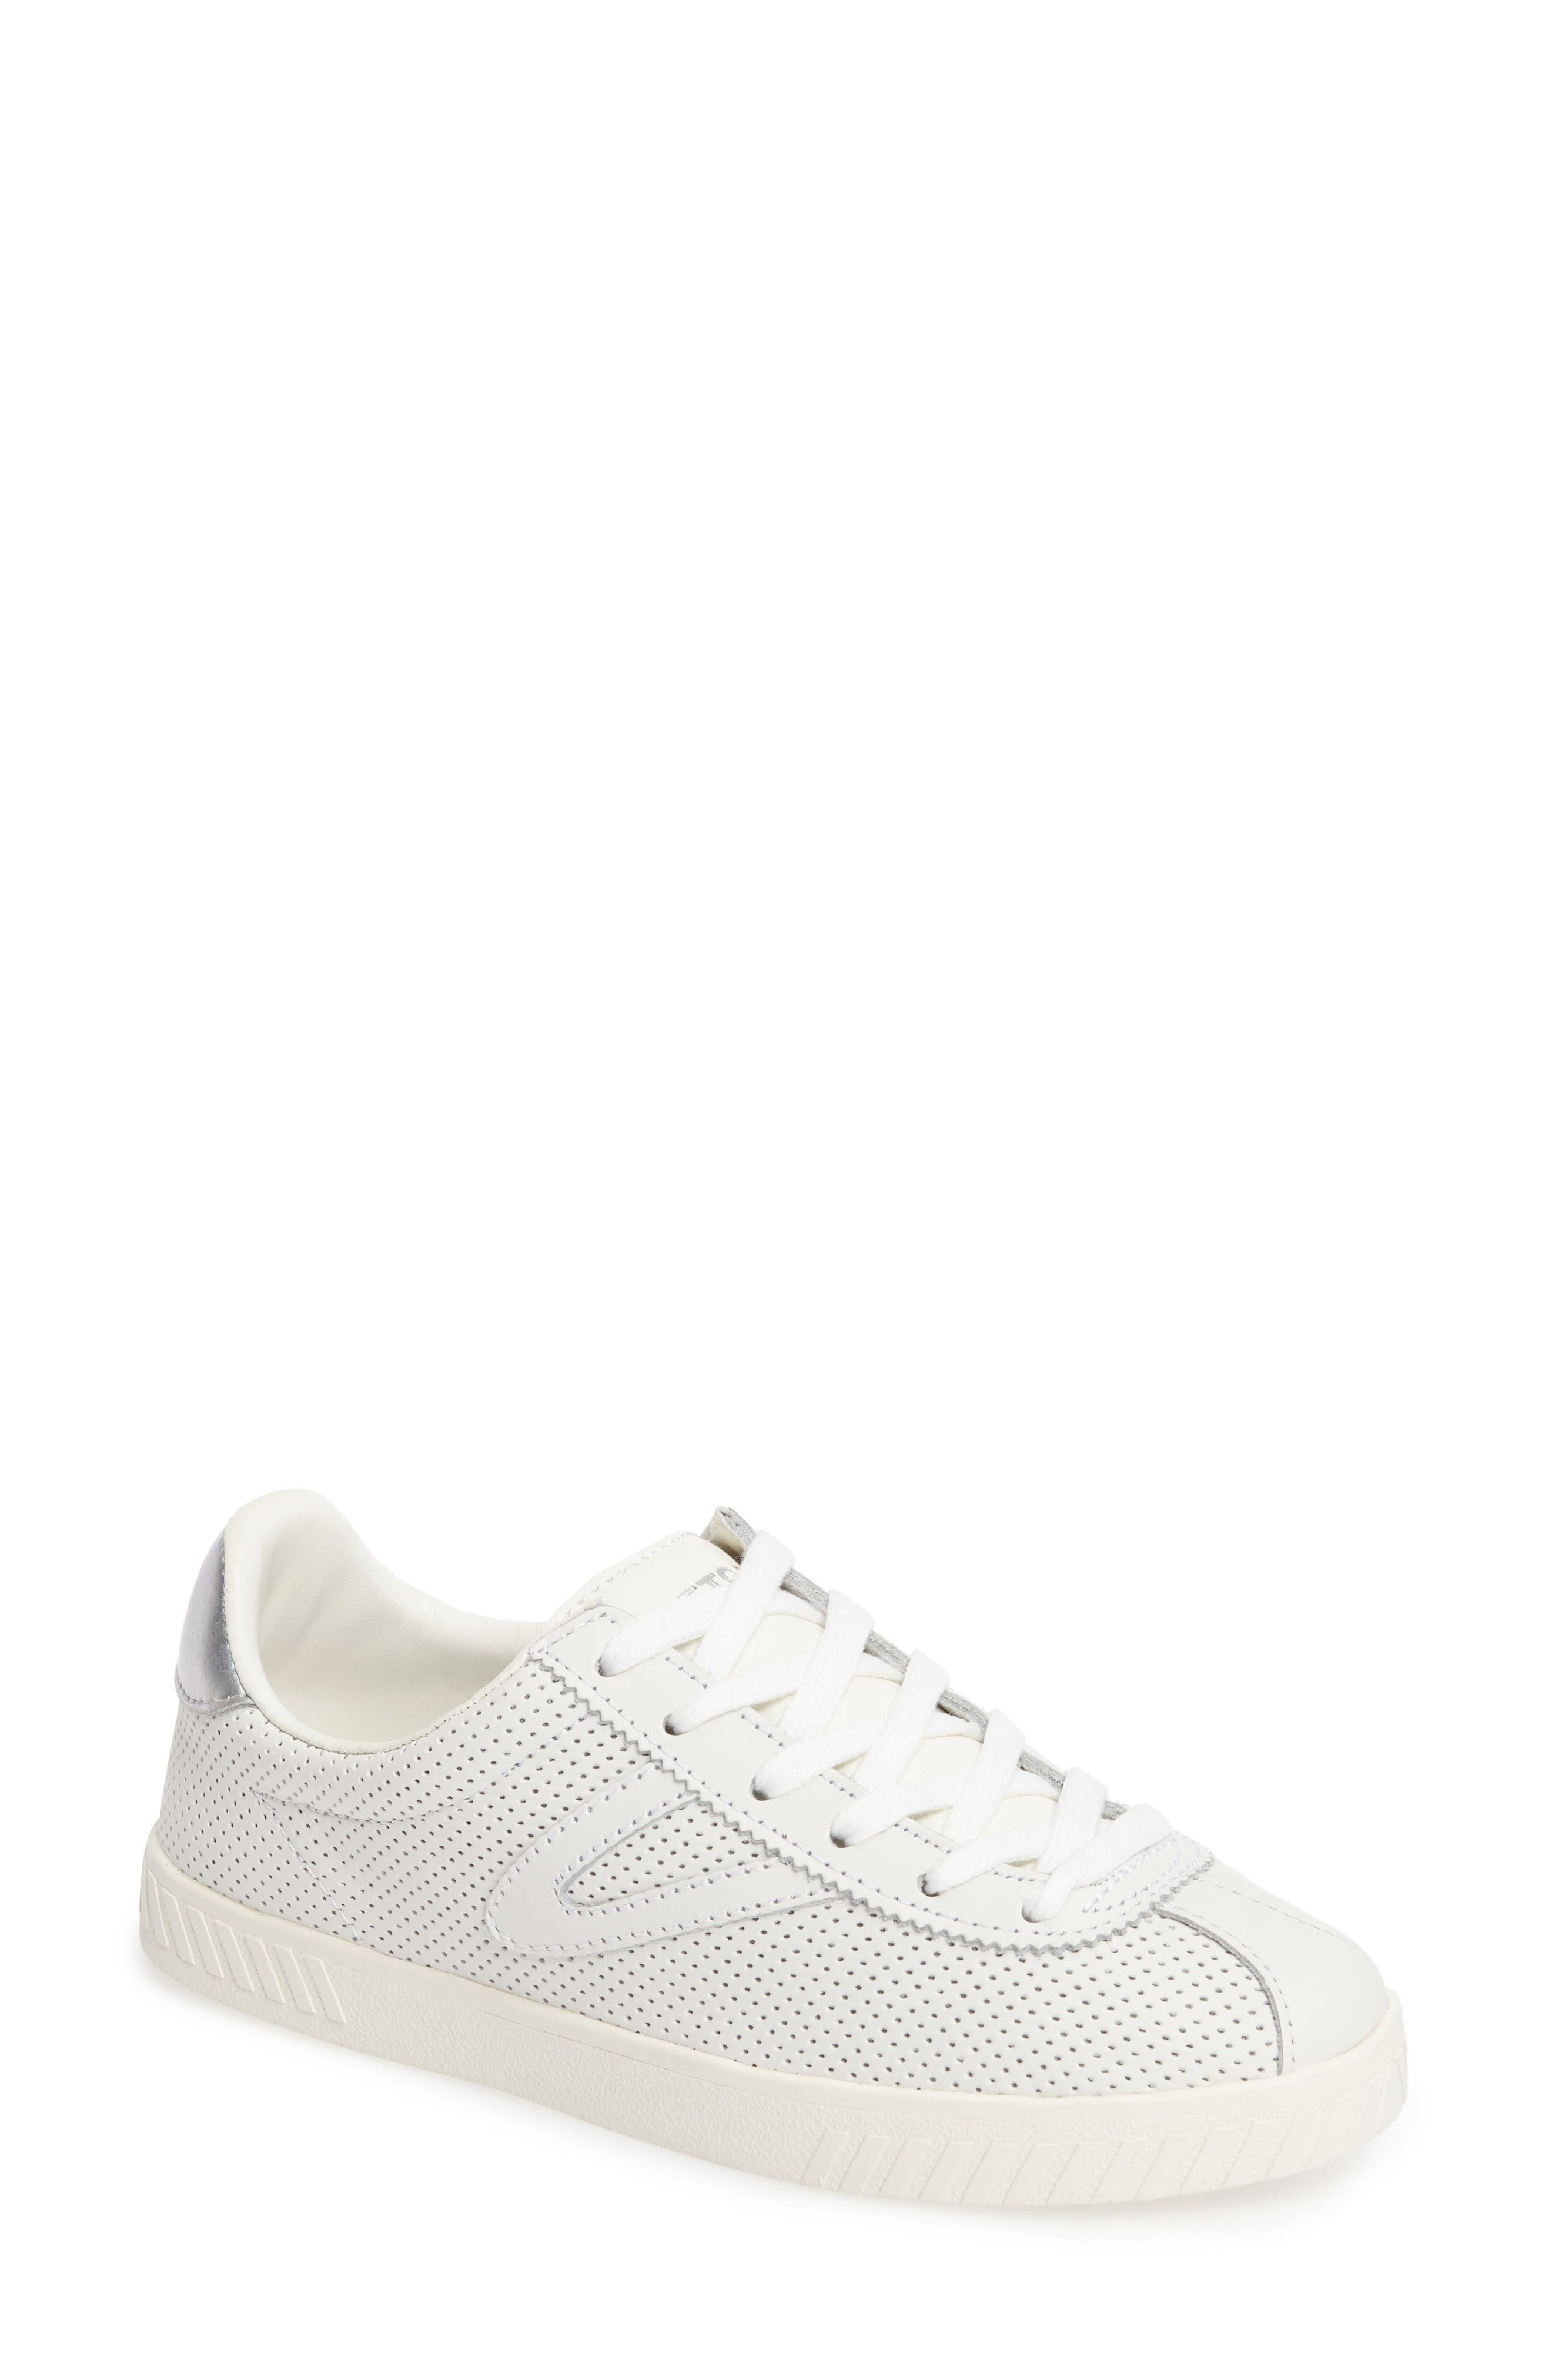 Camden 2 Sneaker,                         Main,                         color, White/ White/ Silver